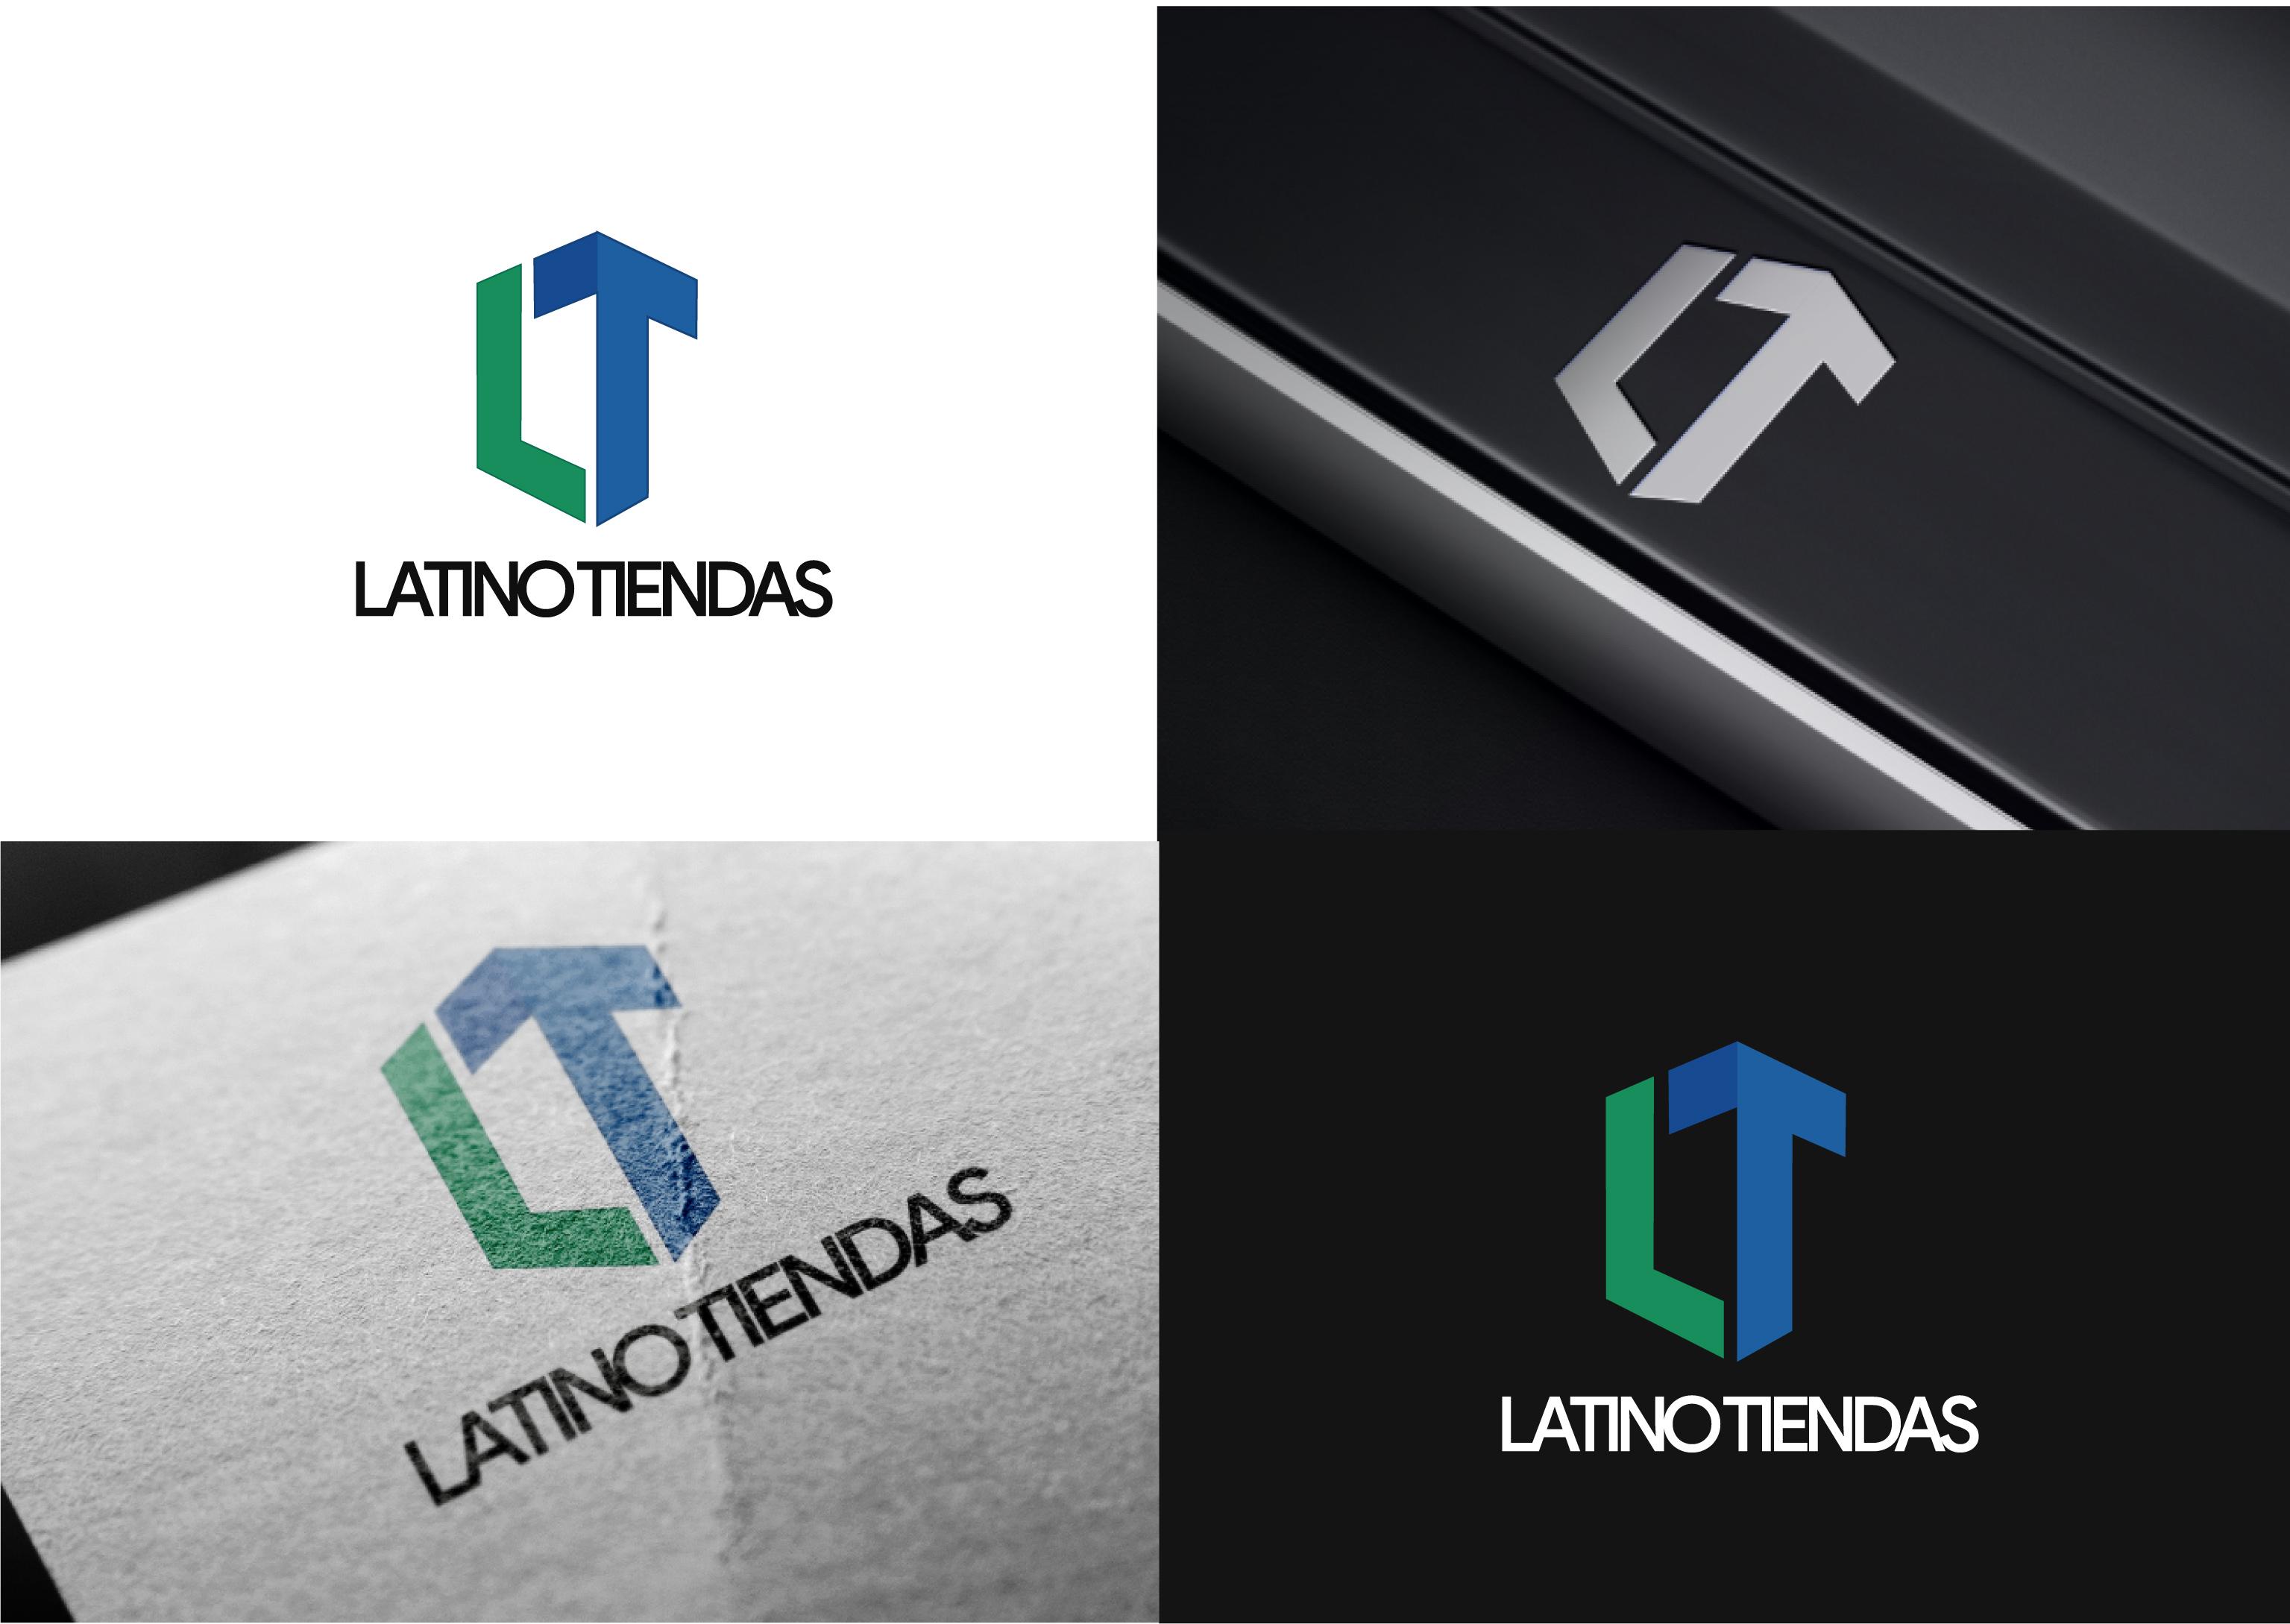 Modern Upmarket Ecommerce Logo Design For Latinotiendas By Javed Iqbal Design 24699950